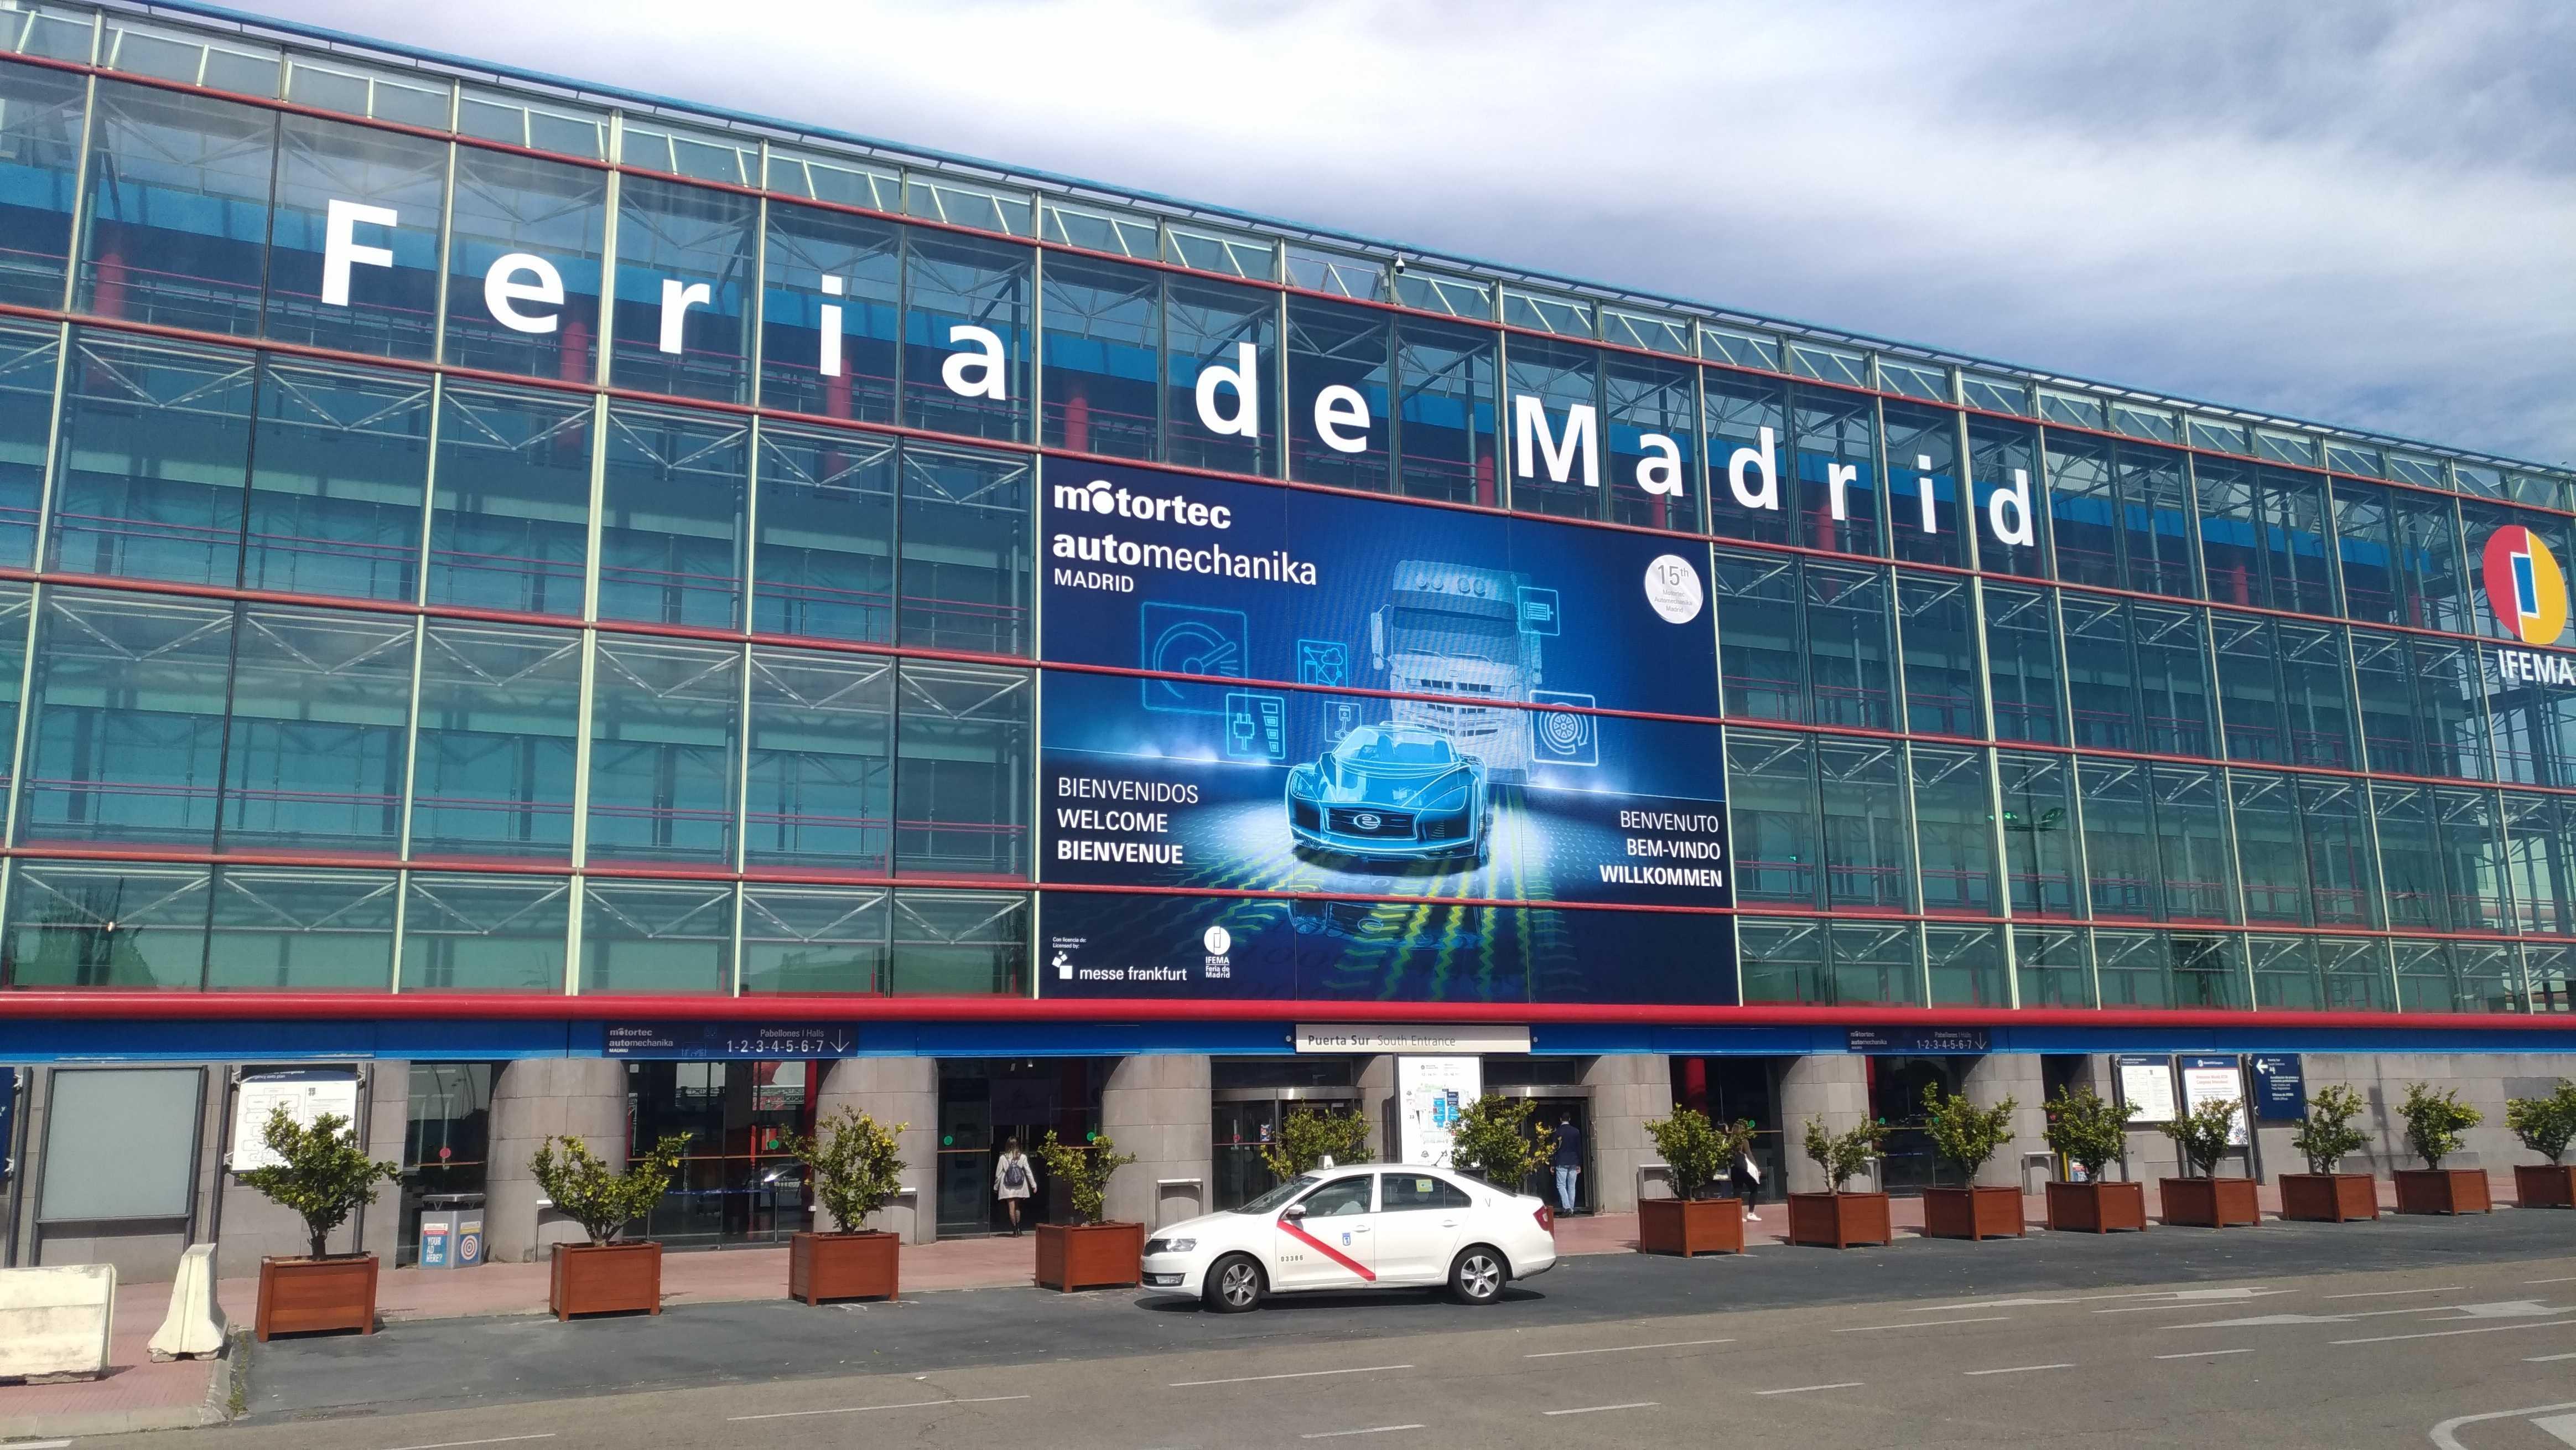 solware Auto - Motortec Automechanika Madrid - winmotor next